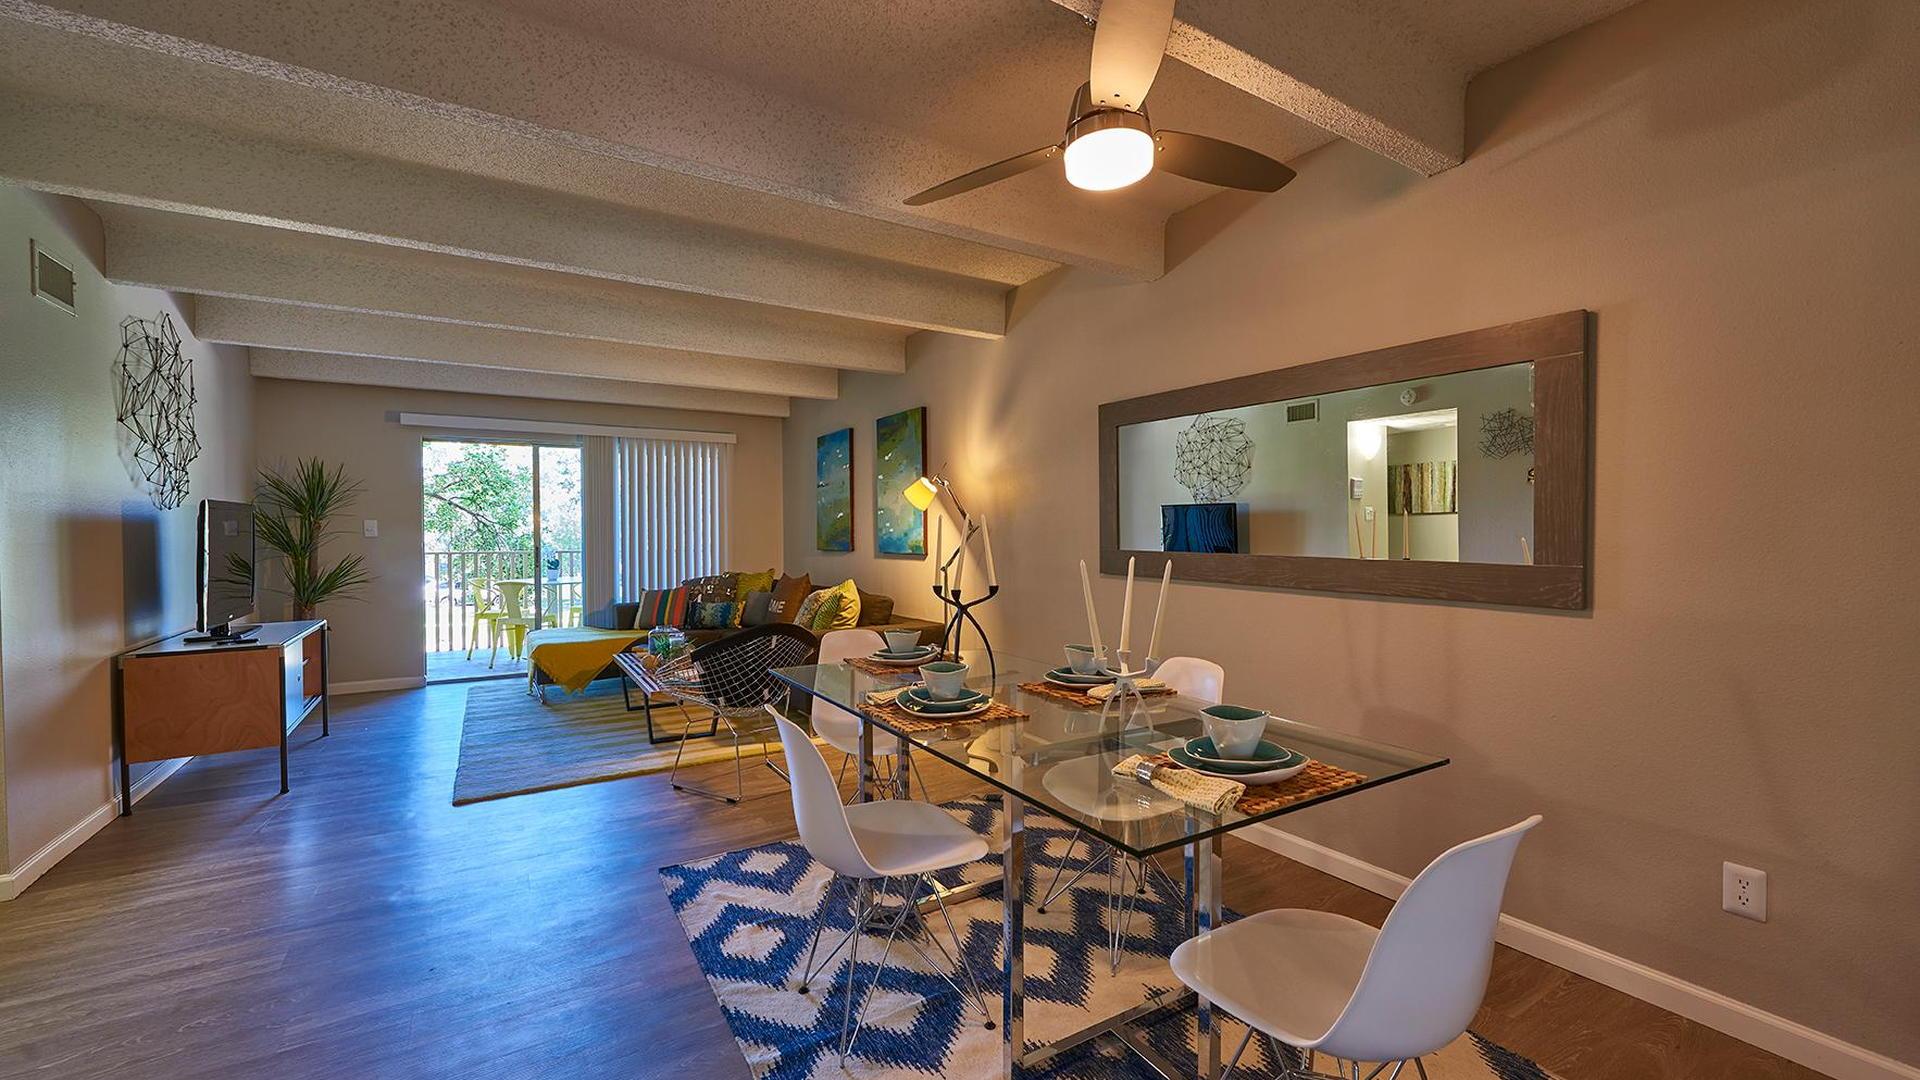 49 Studio Apartments for rent in 80231 | ApartmentRatings©